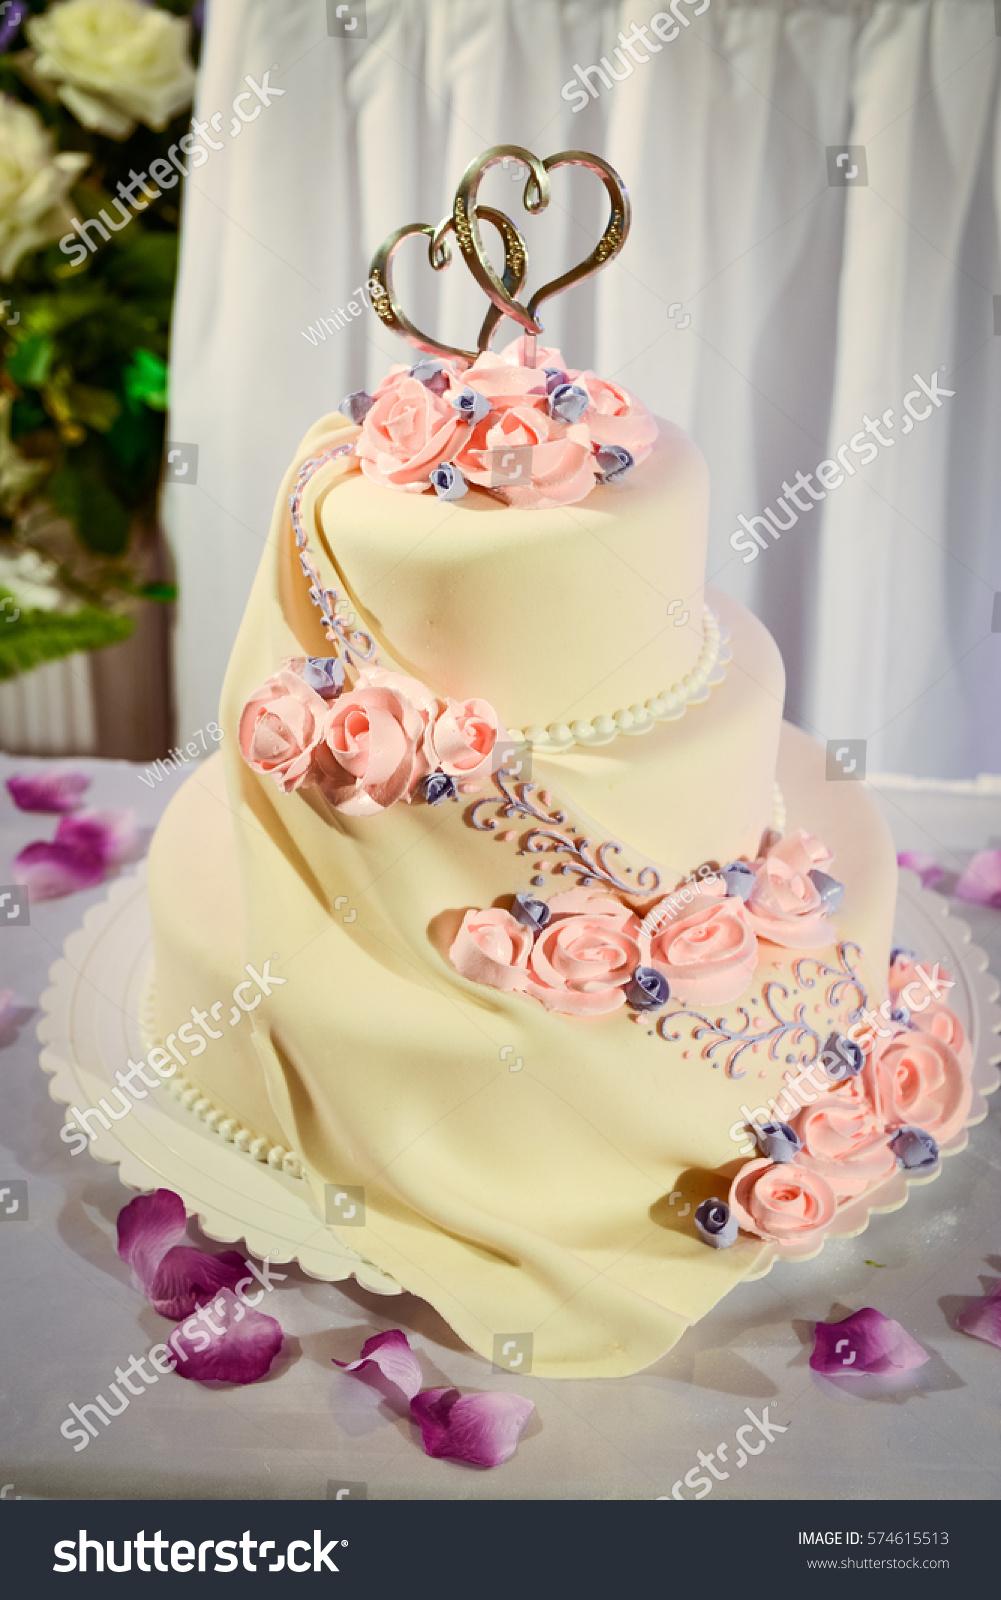 Wedding Cake Red Roses Wedding Table Stock Photo (Edit Now ...